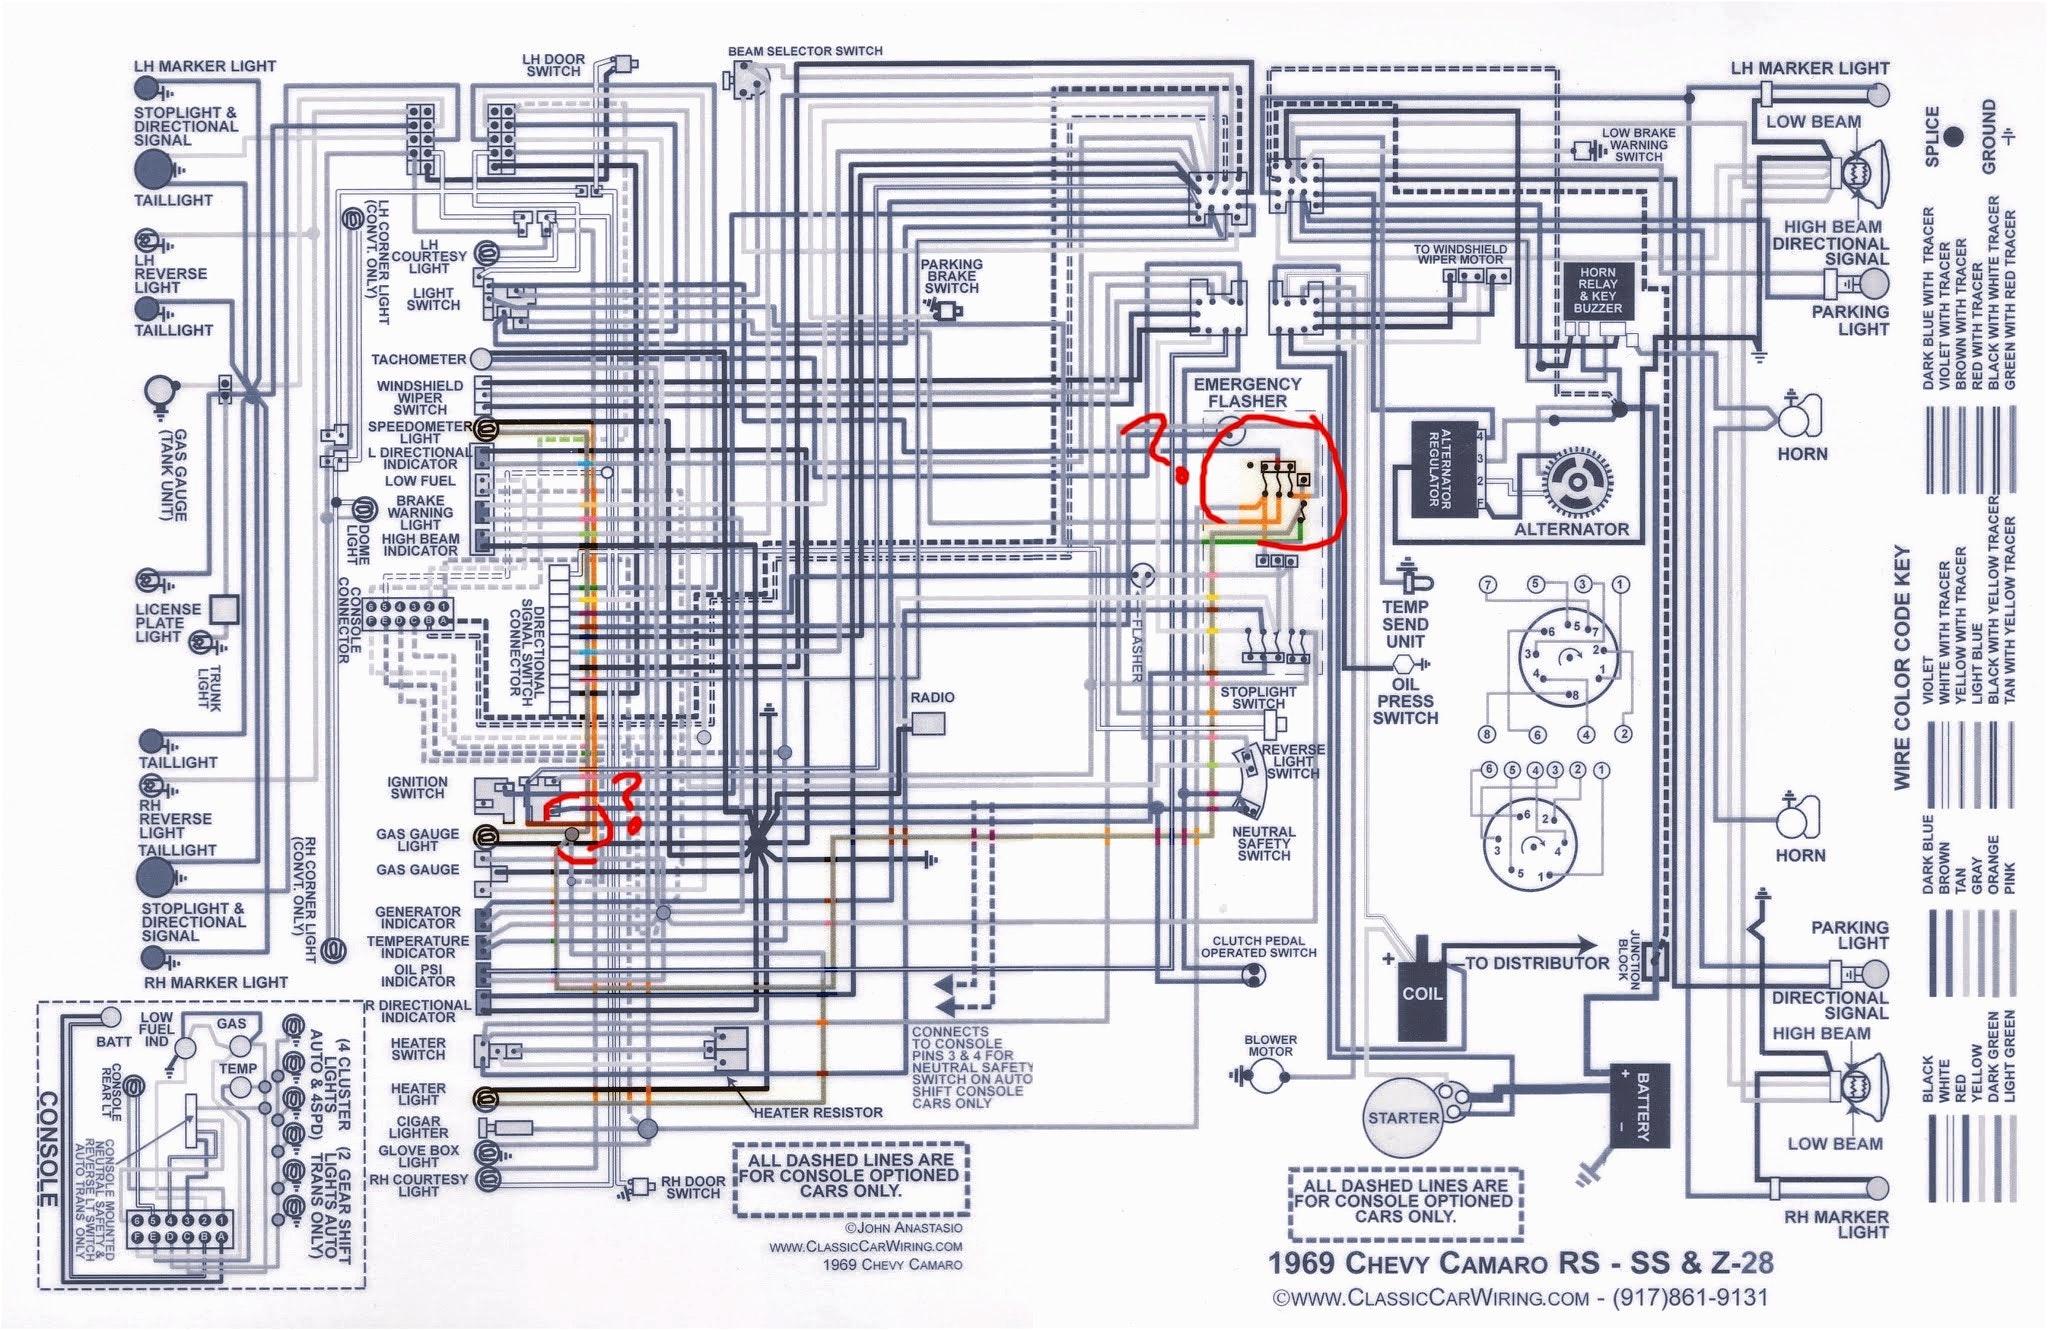 1968 camaro wiring harness diagram head lamp wiring diagram used 1994 camaro wiring diagrams camaro wiring diagrams